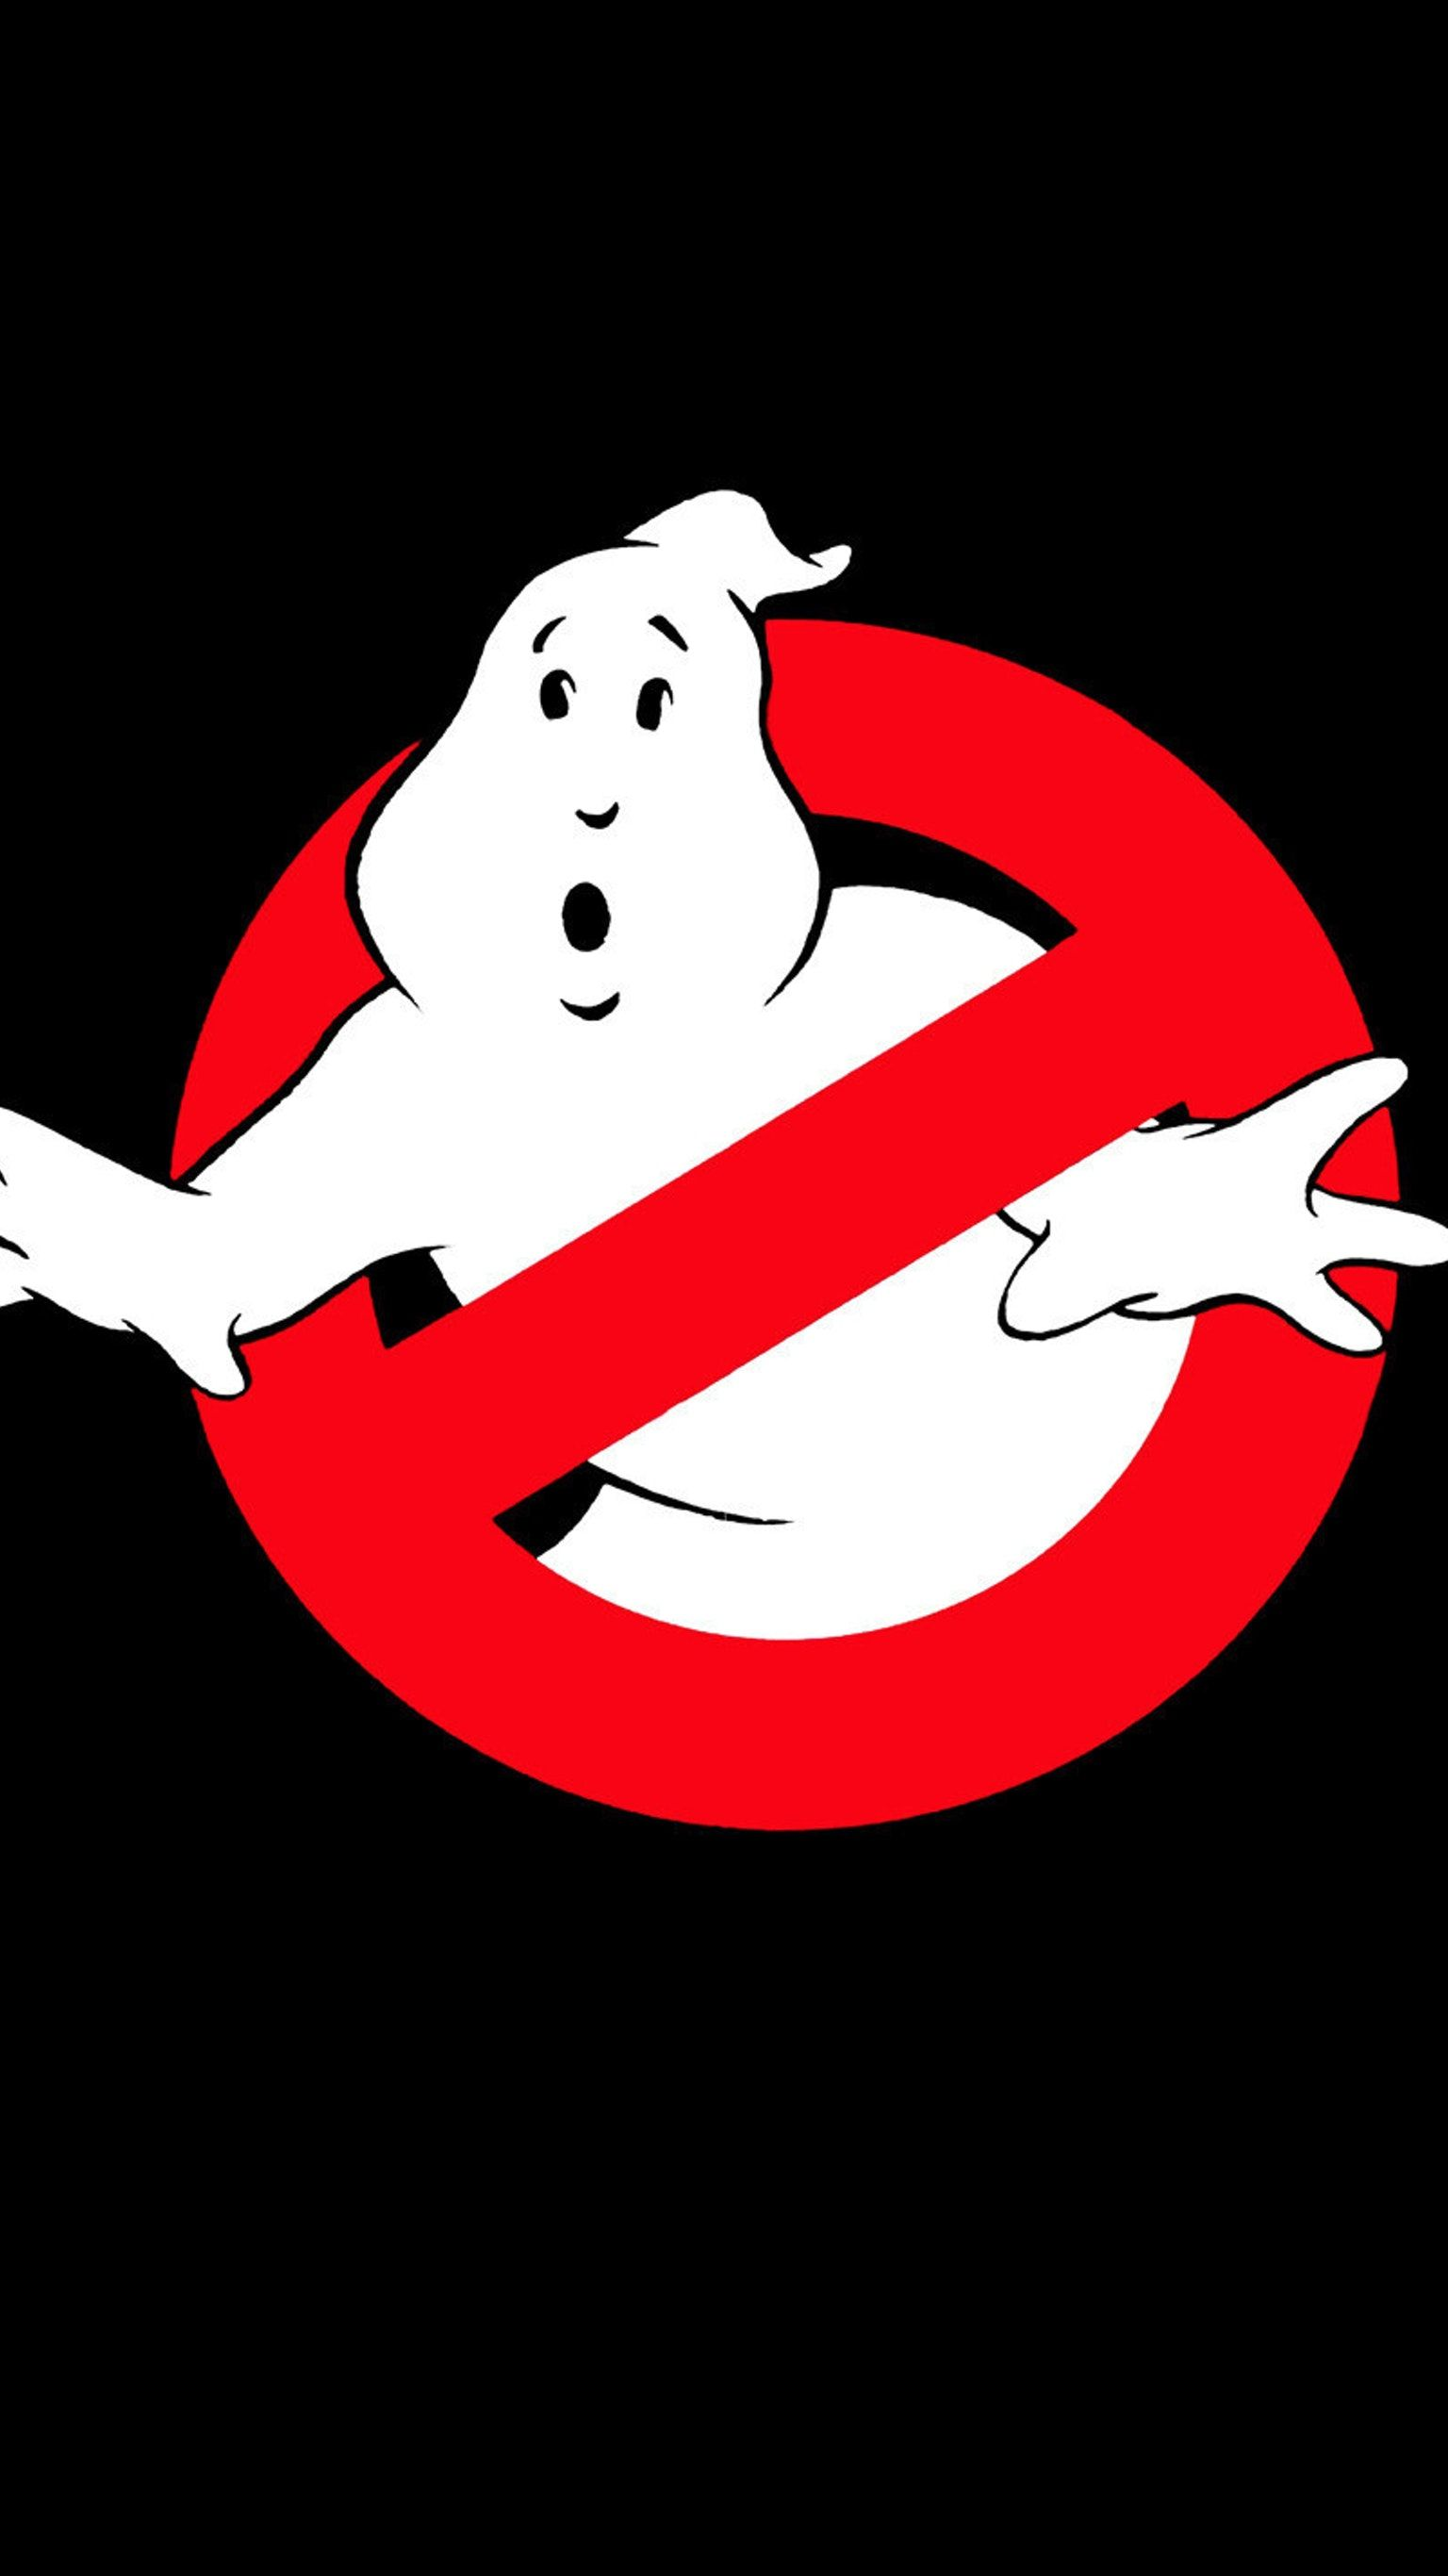 Ghostbusters 1984 Phone Wallpaper Ghostbusters 1984